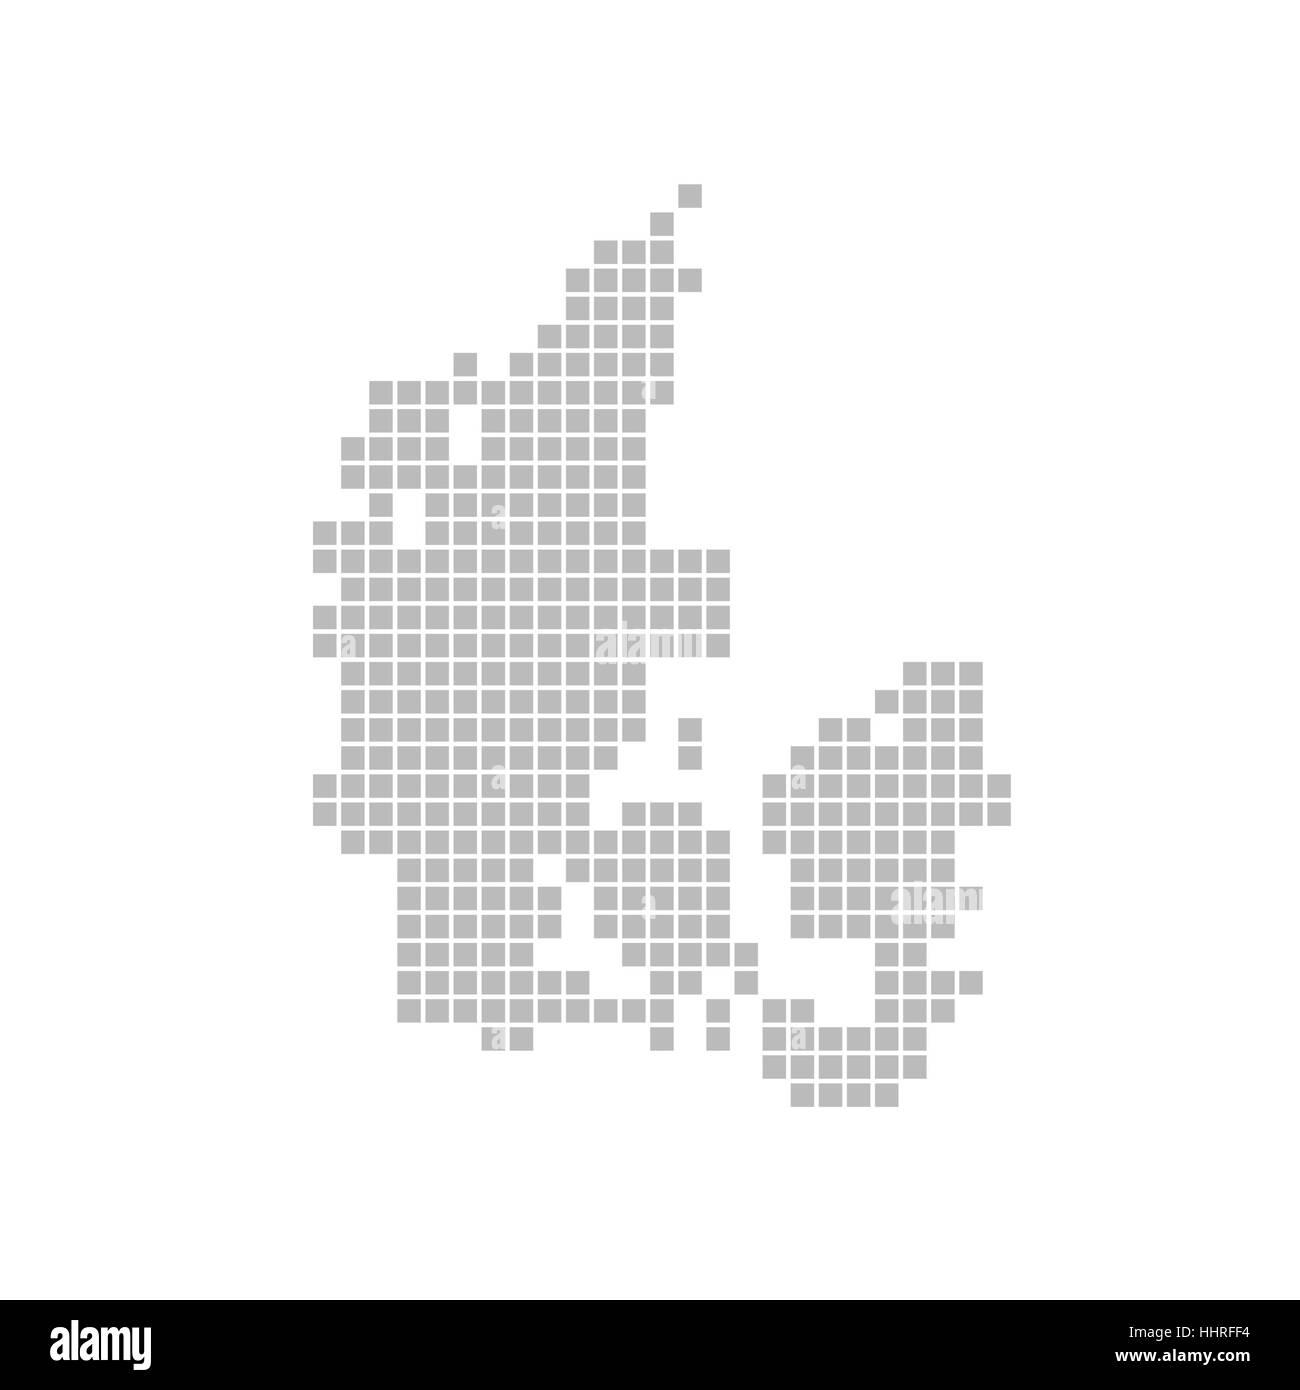 map of pixels: denmark - Stock Image